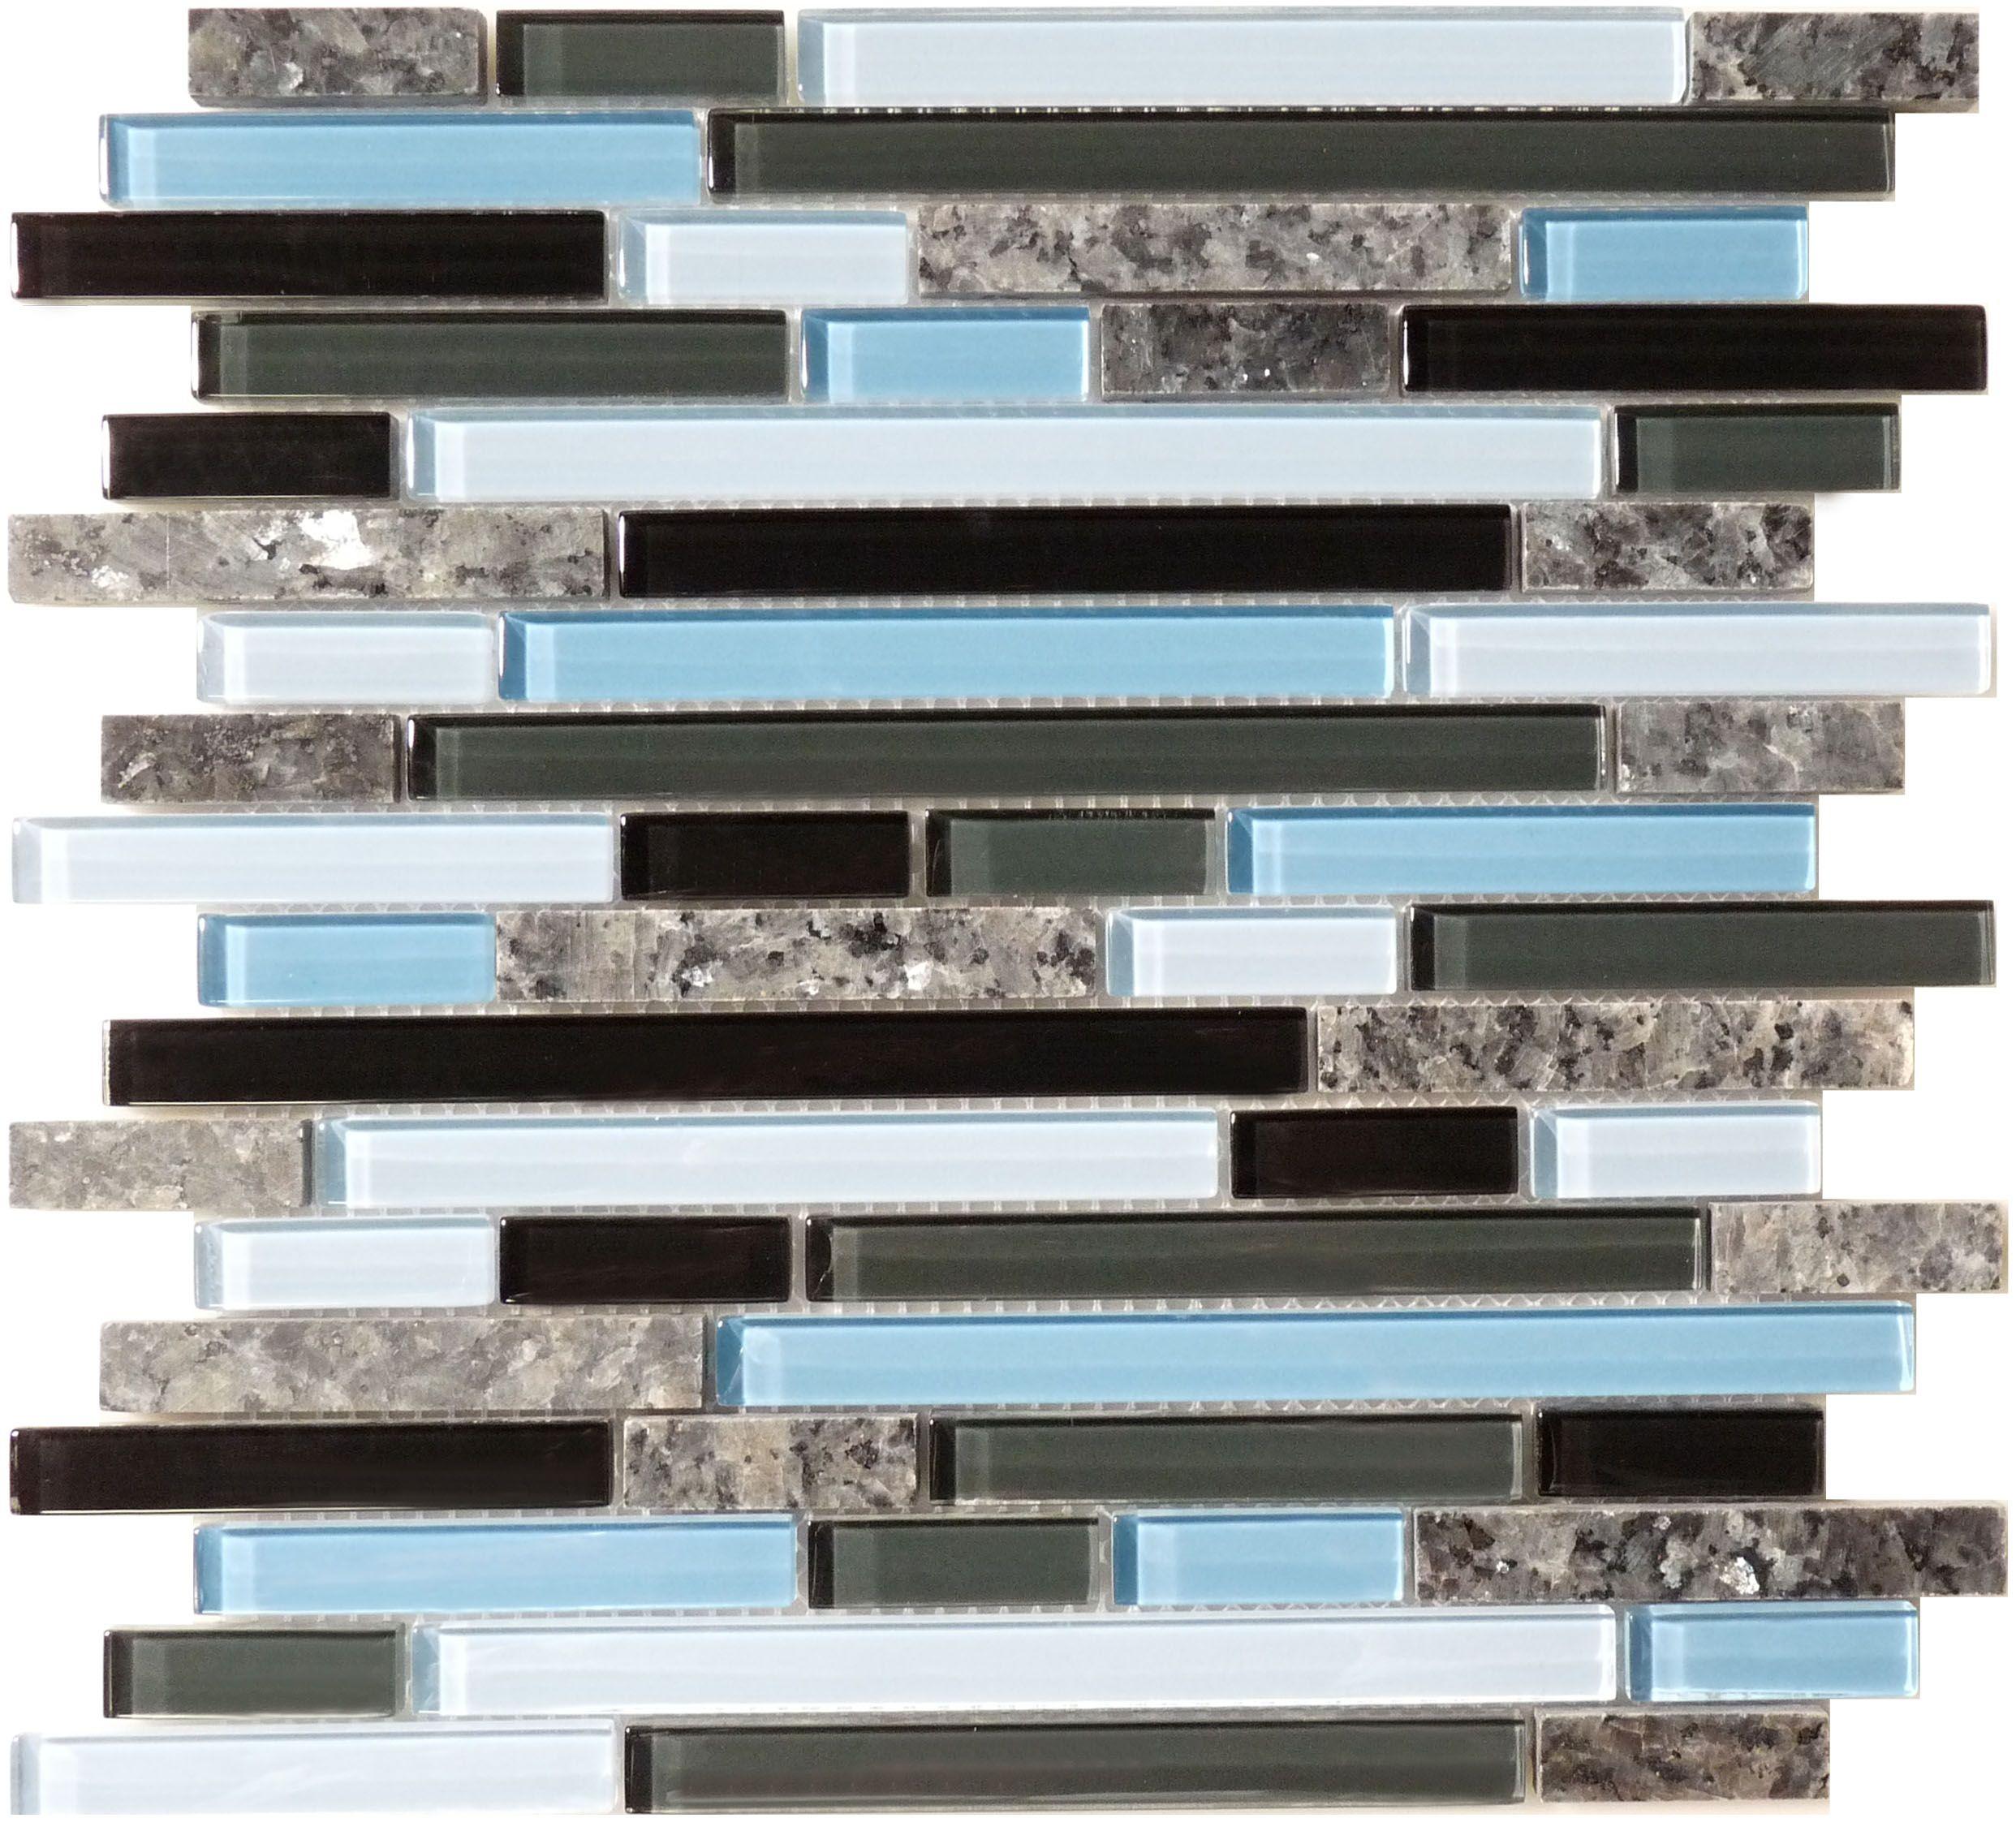 flicker tile random brick random bricks sky glossy blue glass and - Glass Tile Castle Ideas